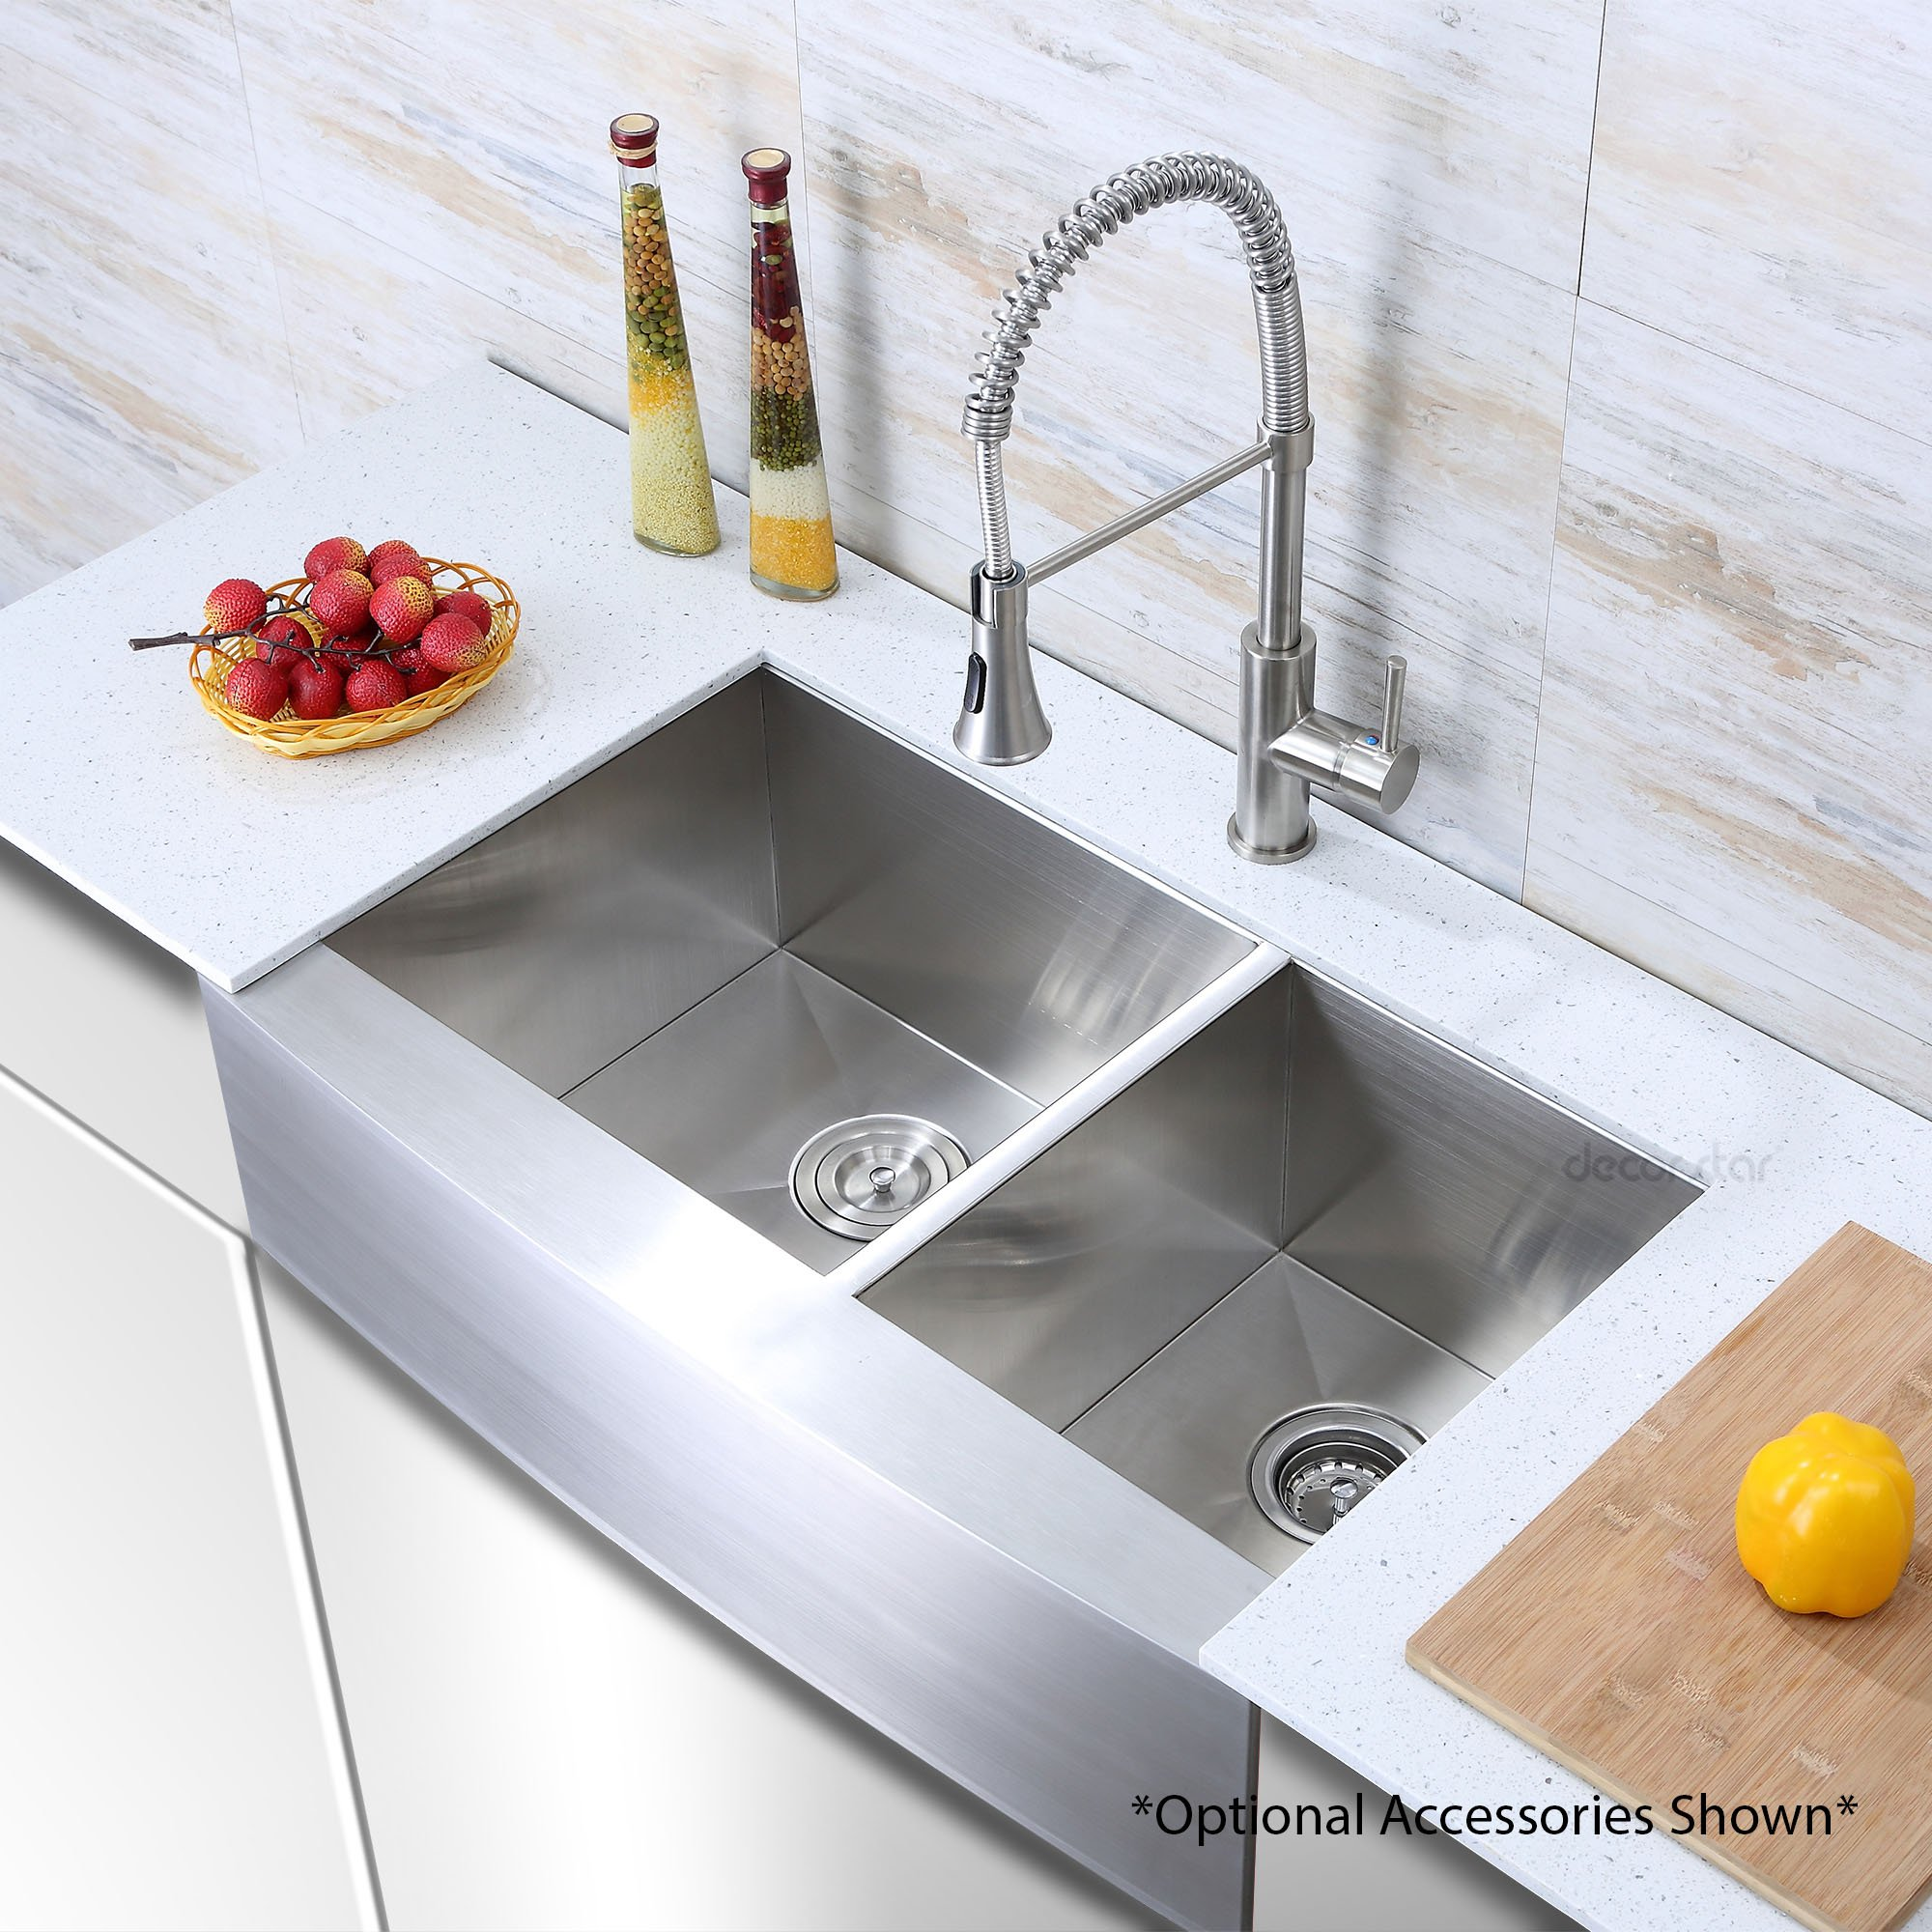 Decor Star F-002-Z 33 Inch x 20 Inch Farmhouse Apron 60/40 Offset Double Bowl 16 Gauge Stainless Steel Luxury Handmade Kitchen Sink cUPC Zero Radius